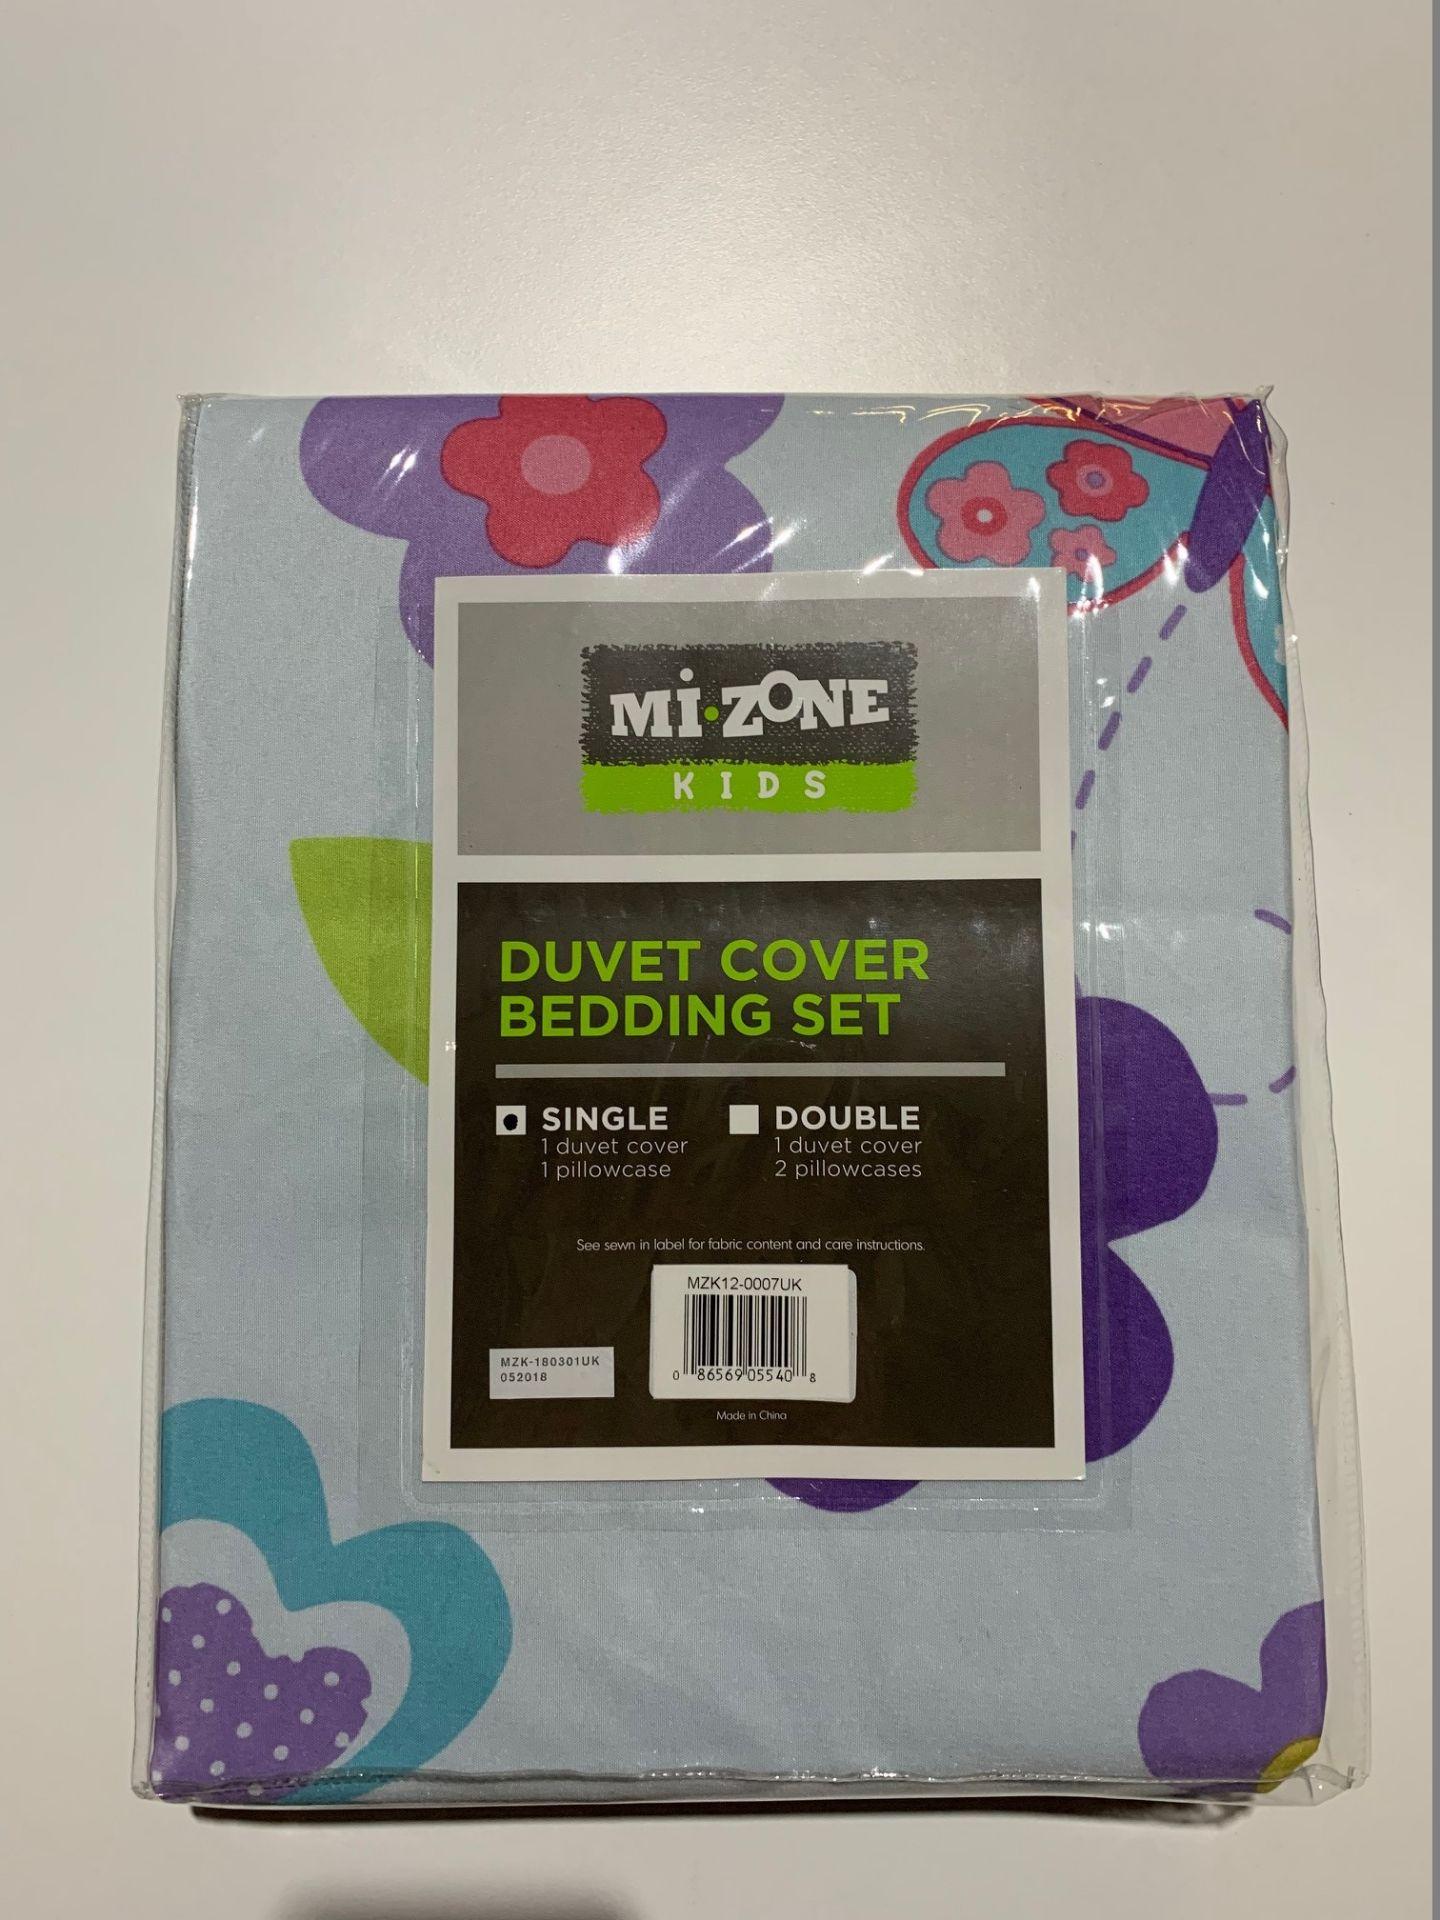 Lot 83 - 1 x Mi-Zone Fluttering Farrah Single Duvet Set - Product Code MZ12-0007UK (Brand New - RRP £21.99)